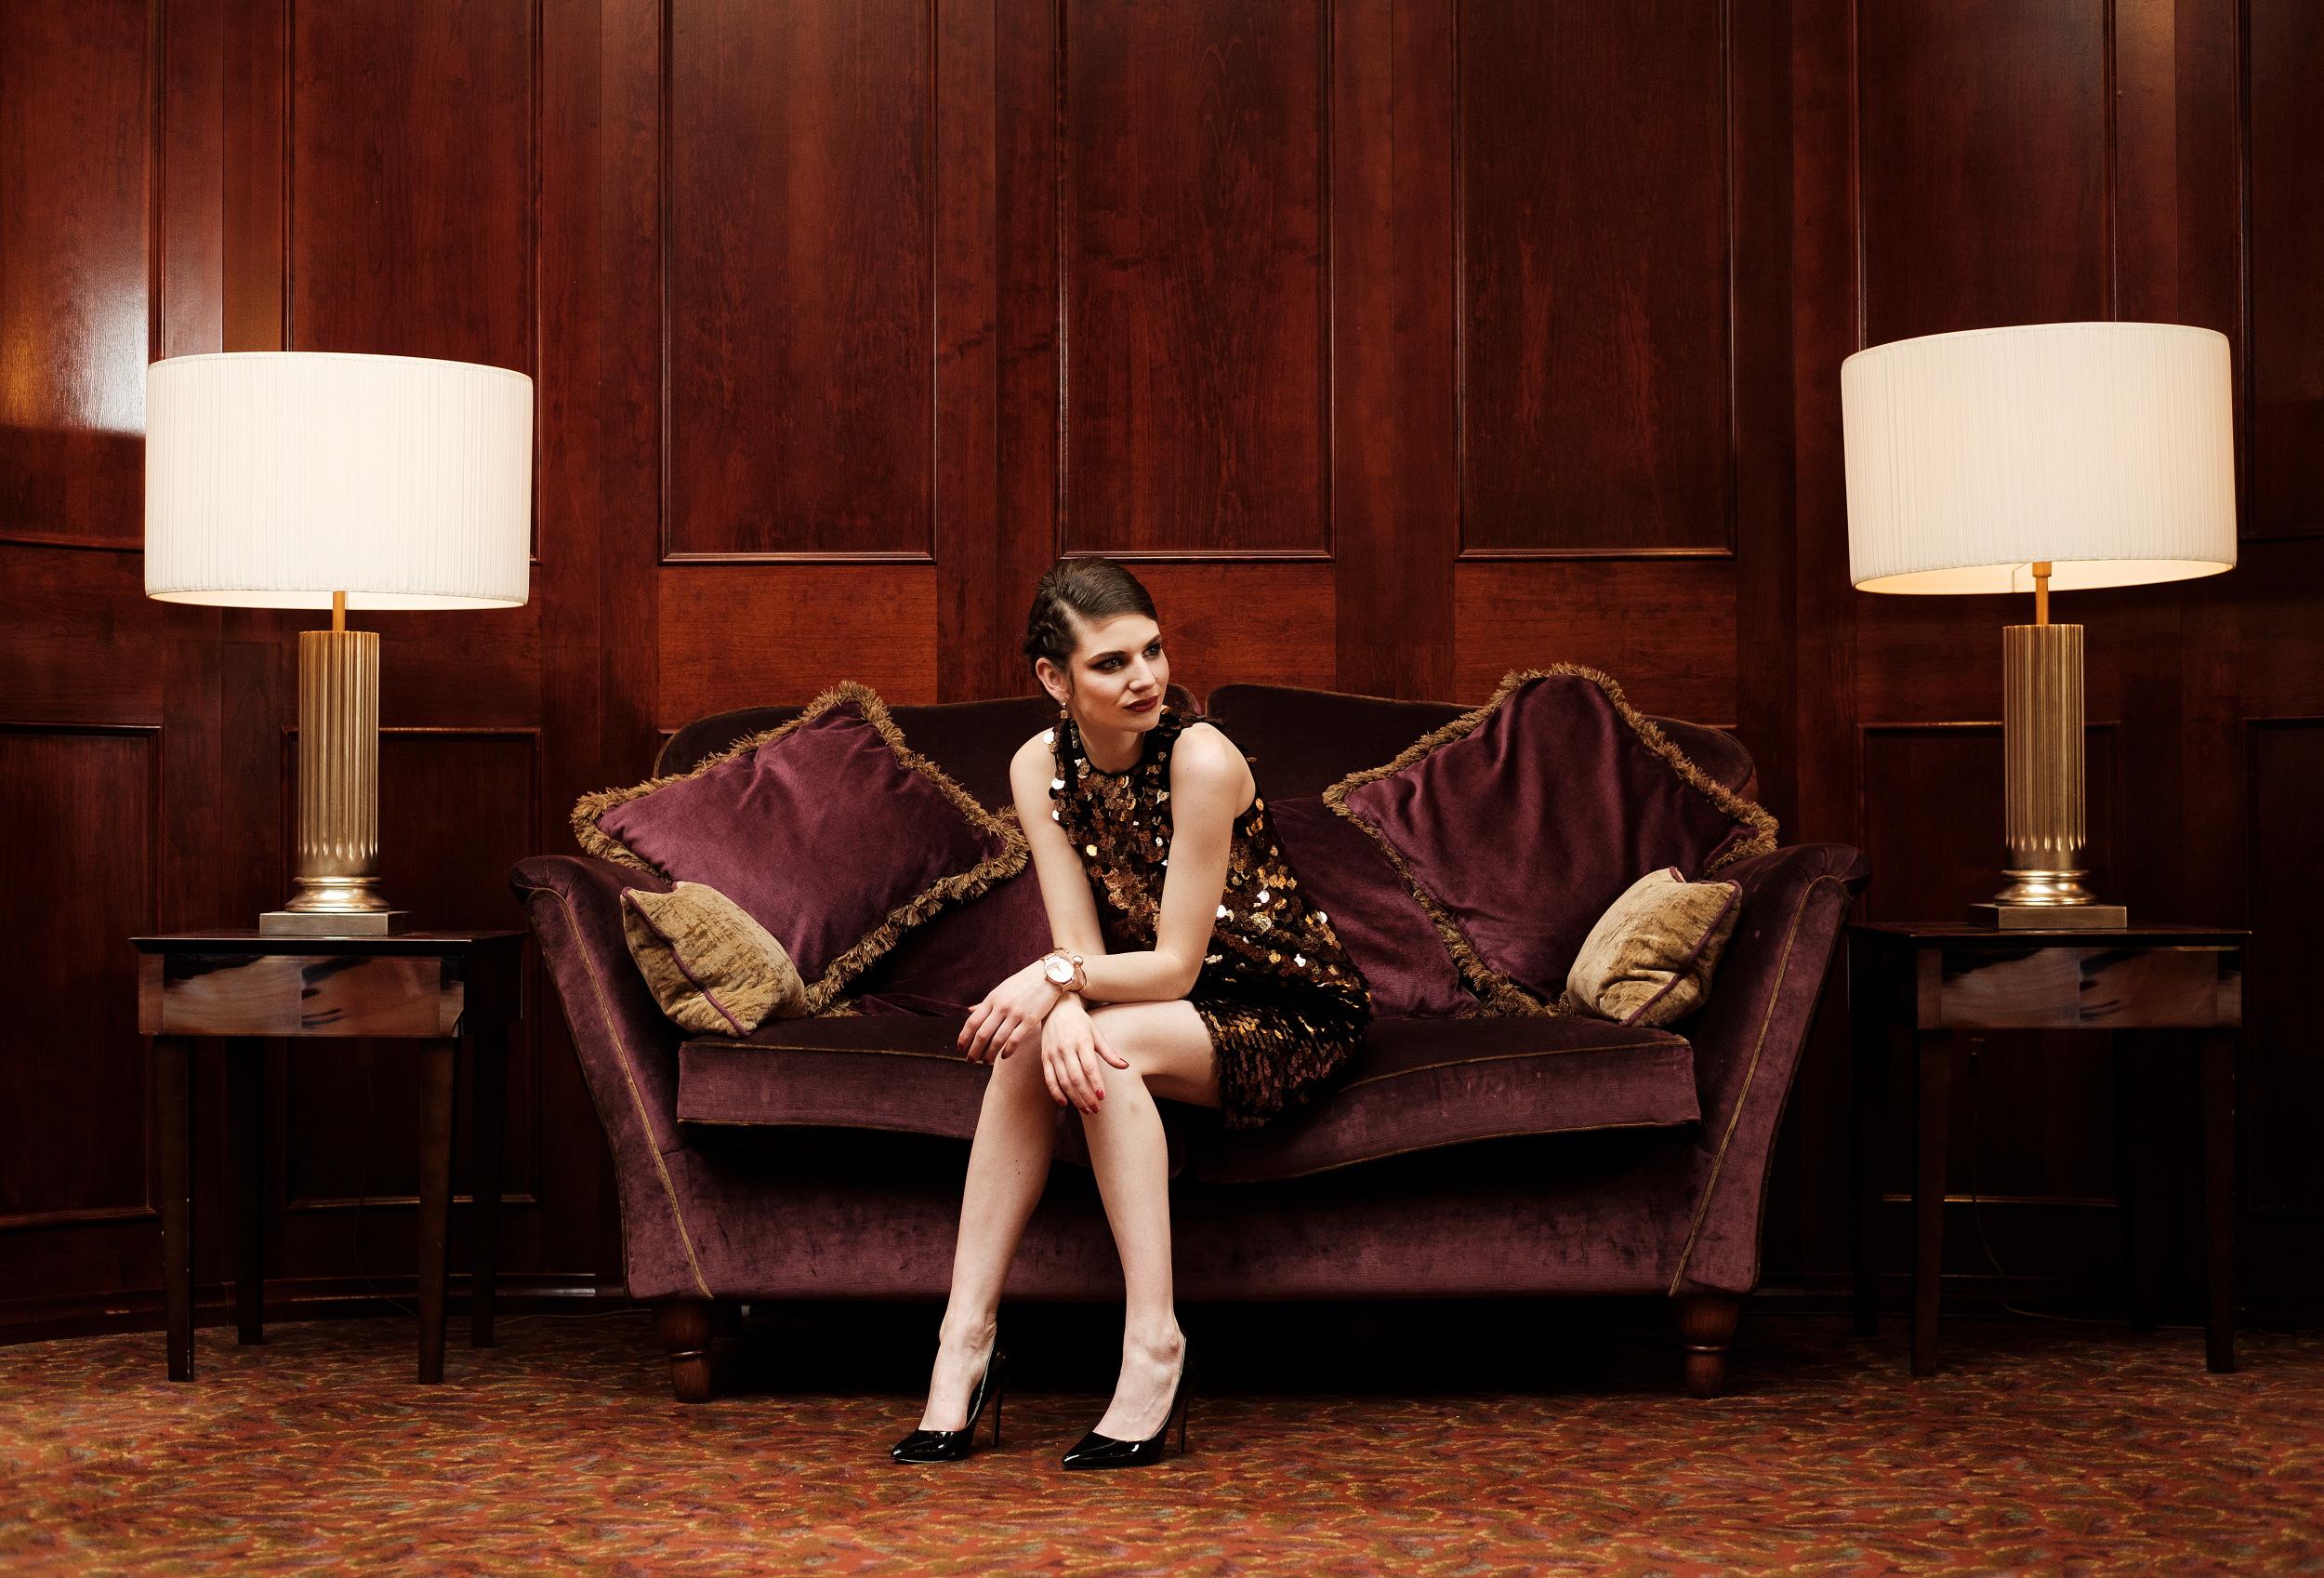 fashion photography belfast_008.JPG